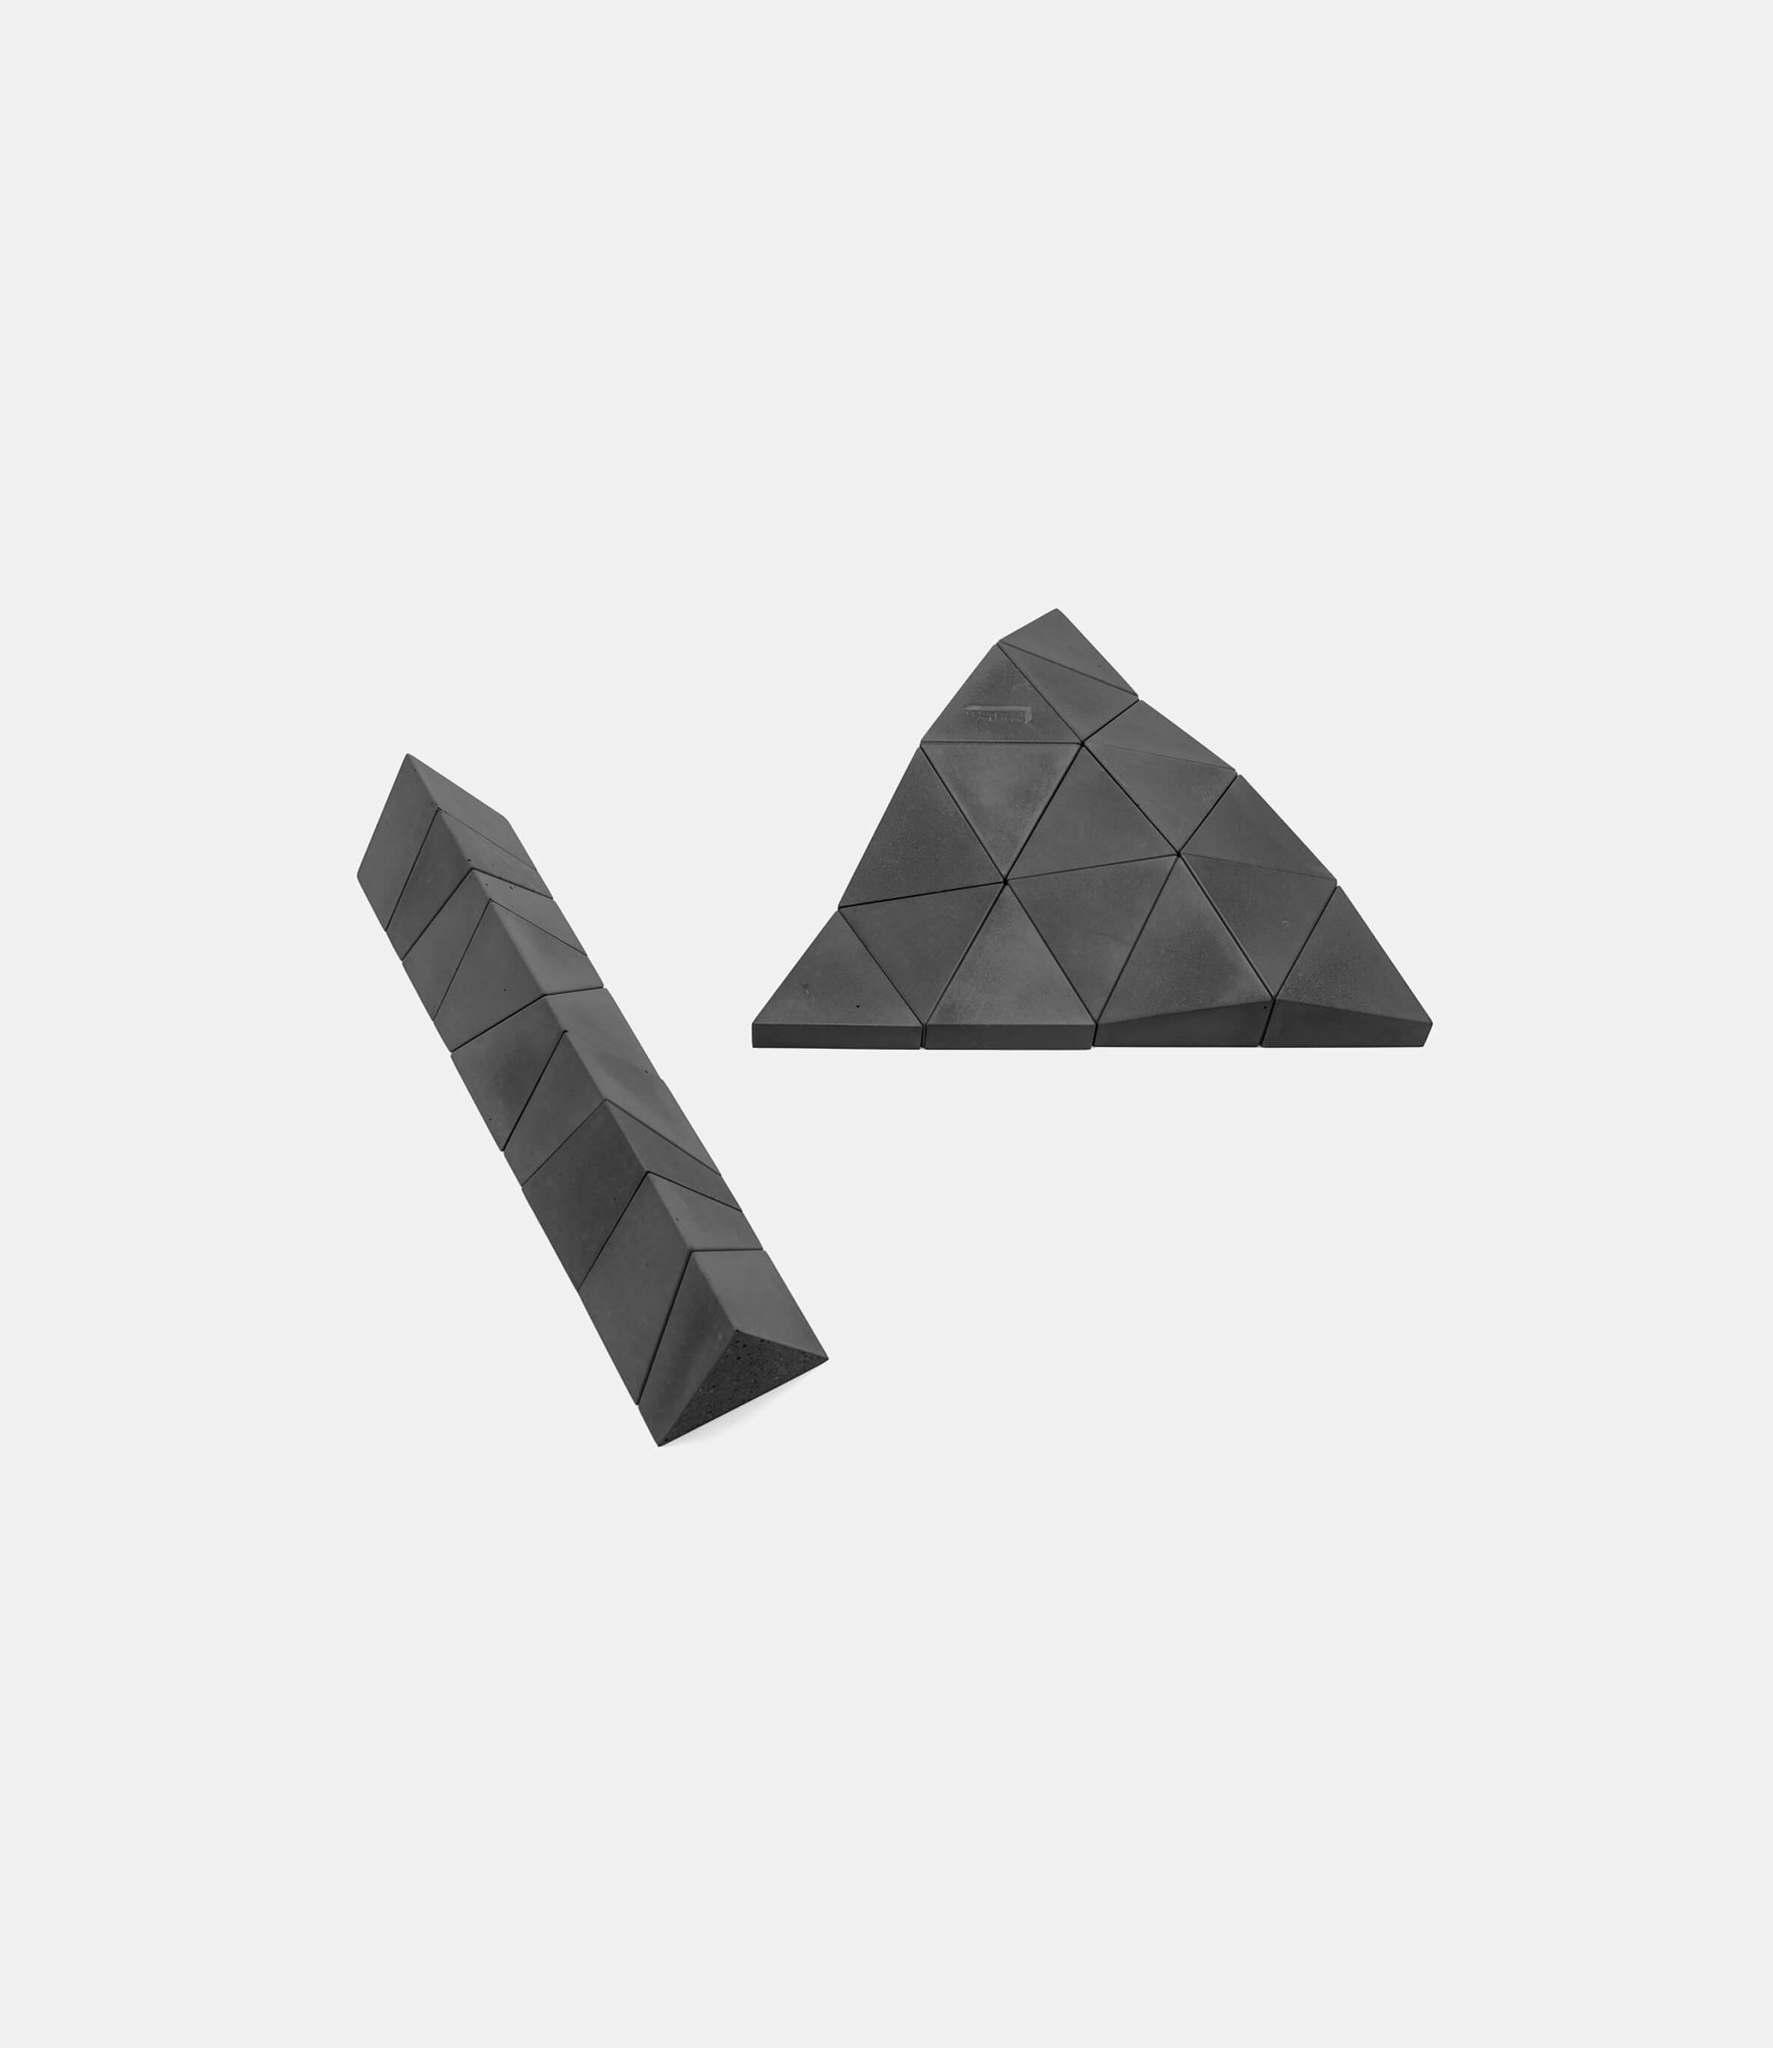 Logideez Logifaces Original Set Basalt — пазл из бетона: серый базальт